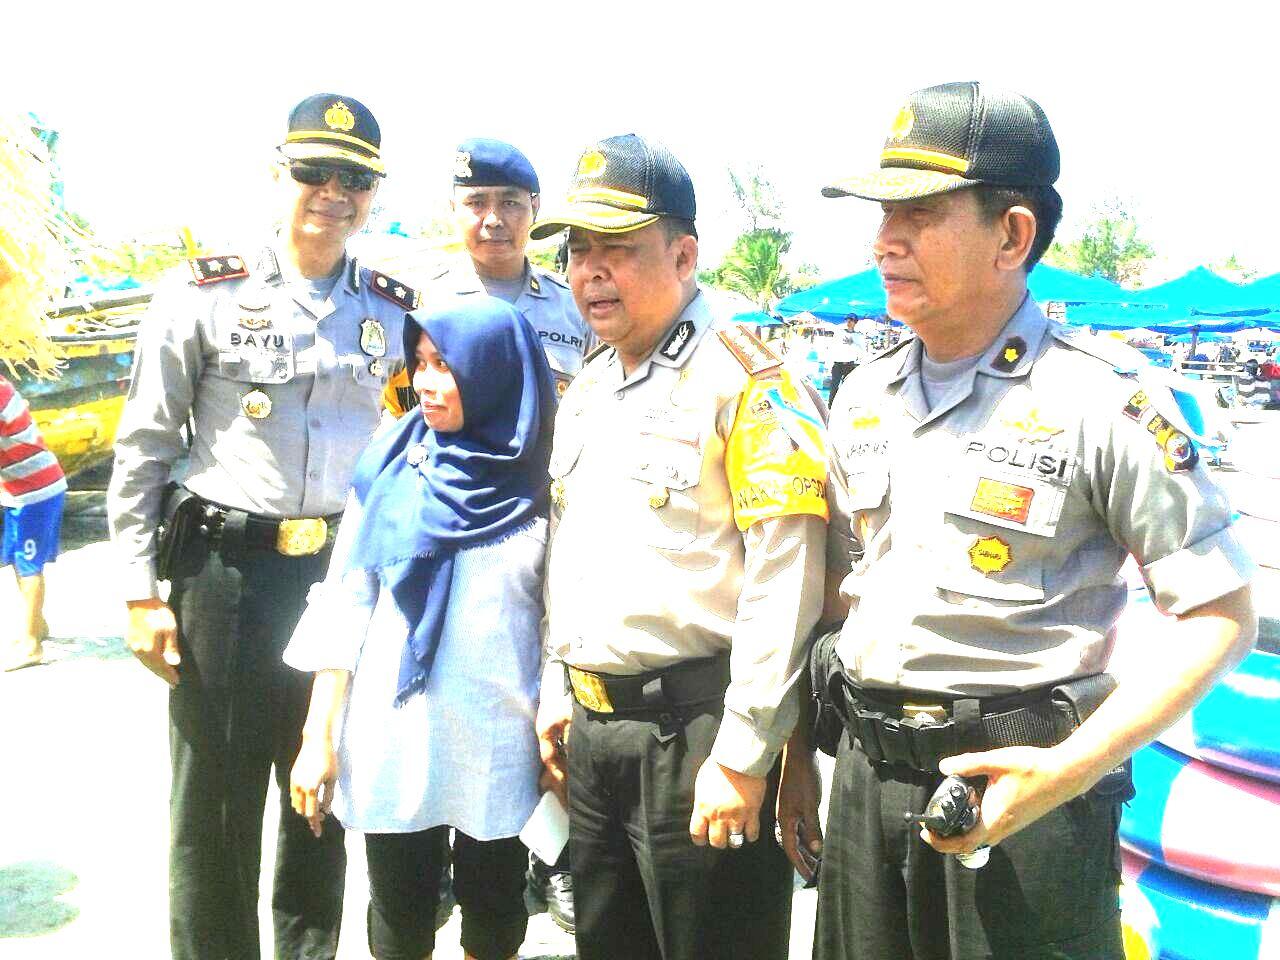 Wakapolda Bengkulu: Berikan Pelayanan Terbaik Untuk Masyarakat